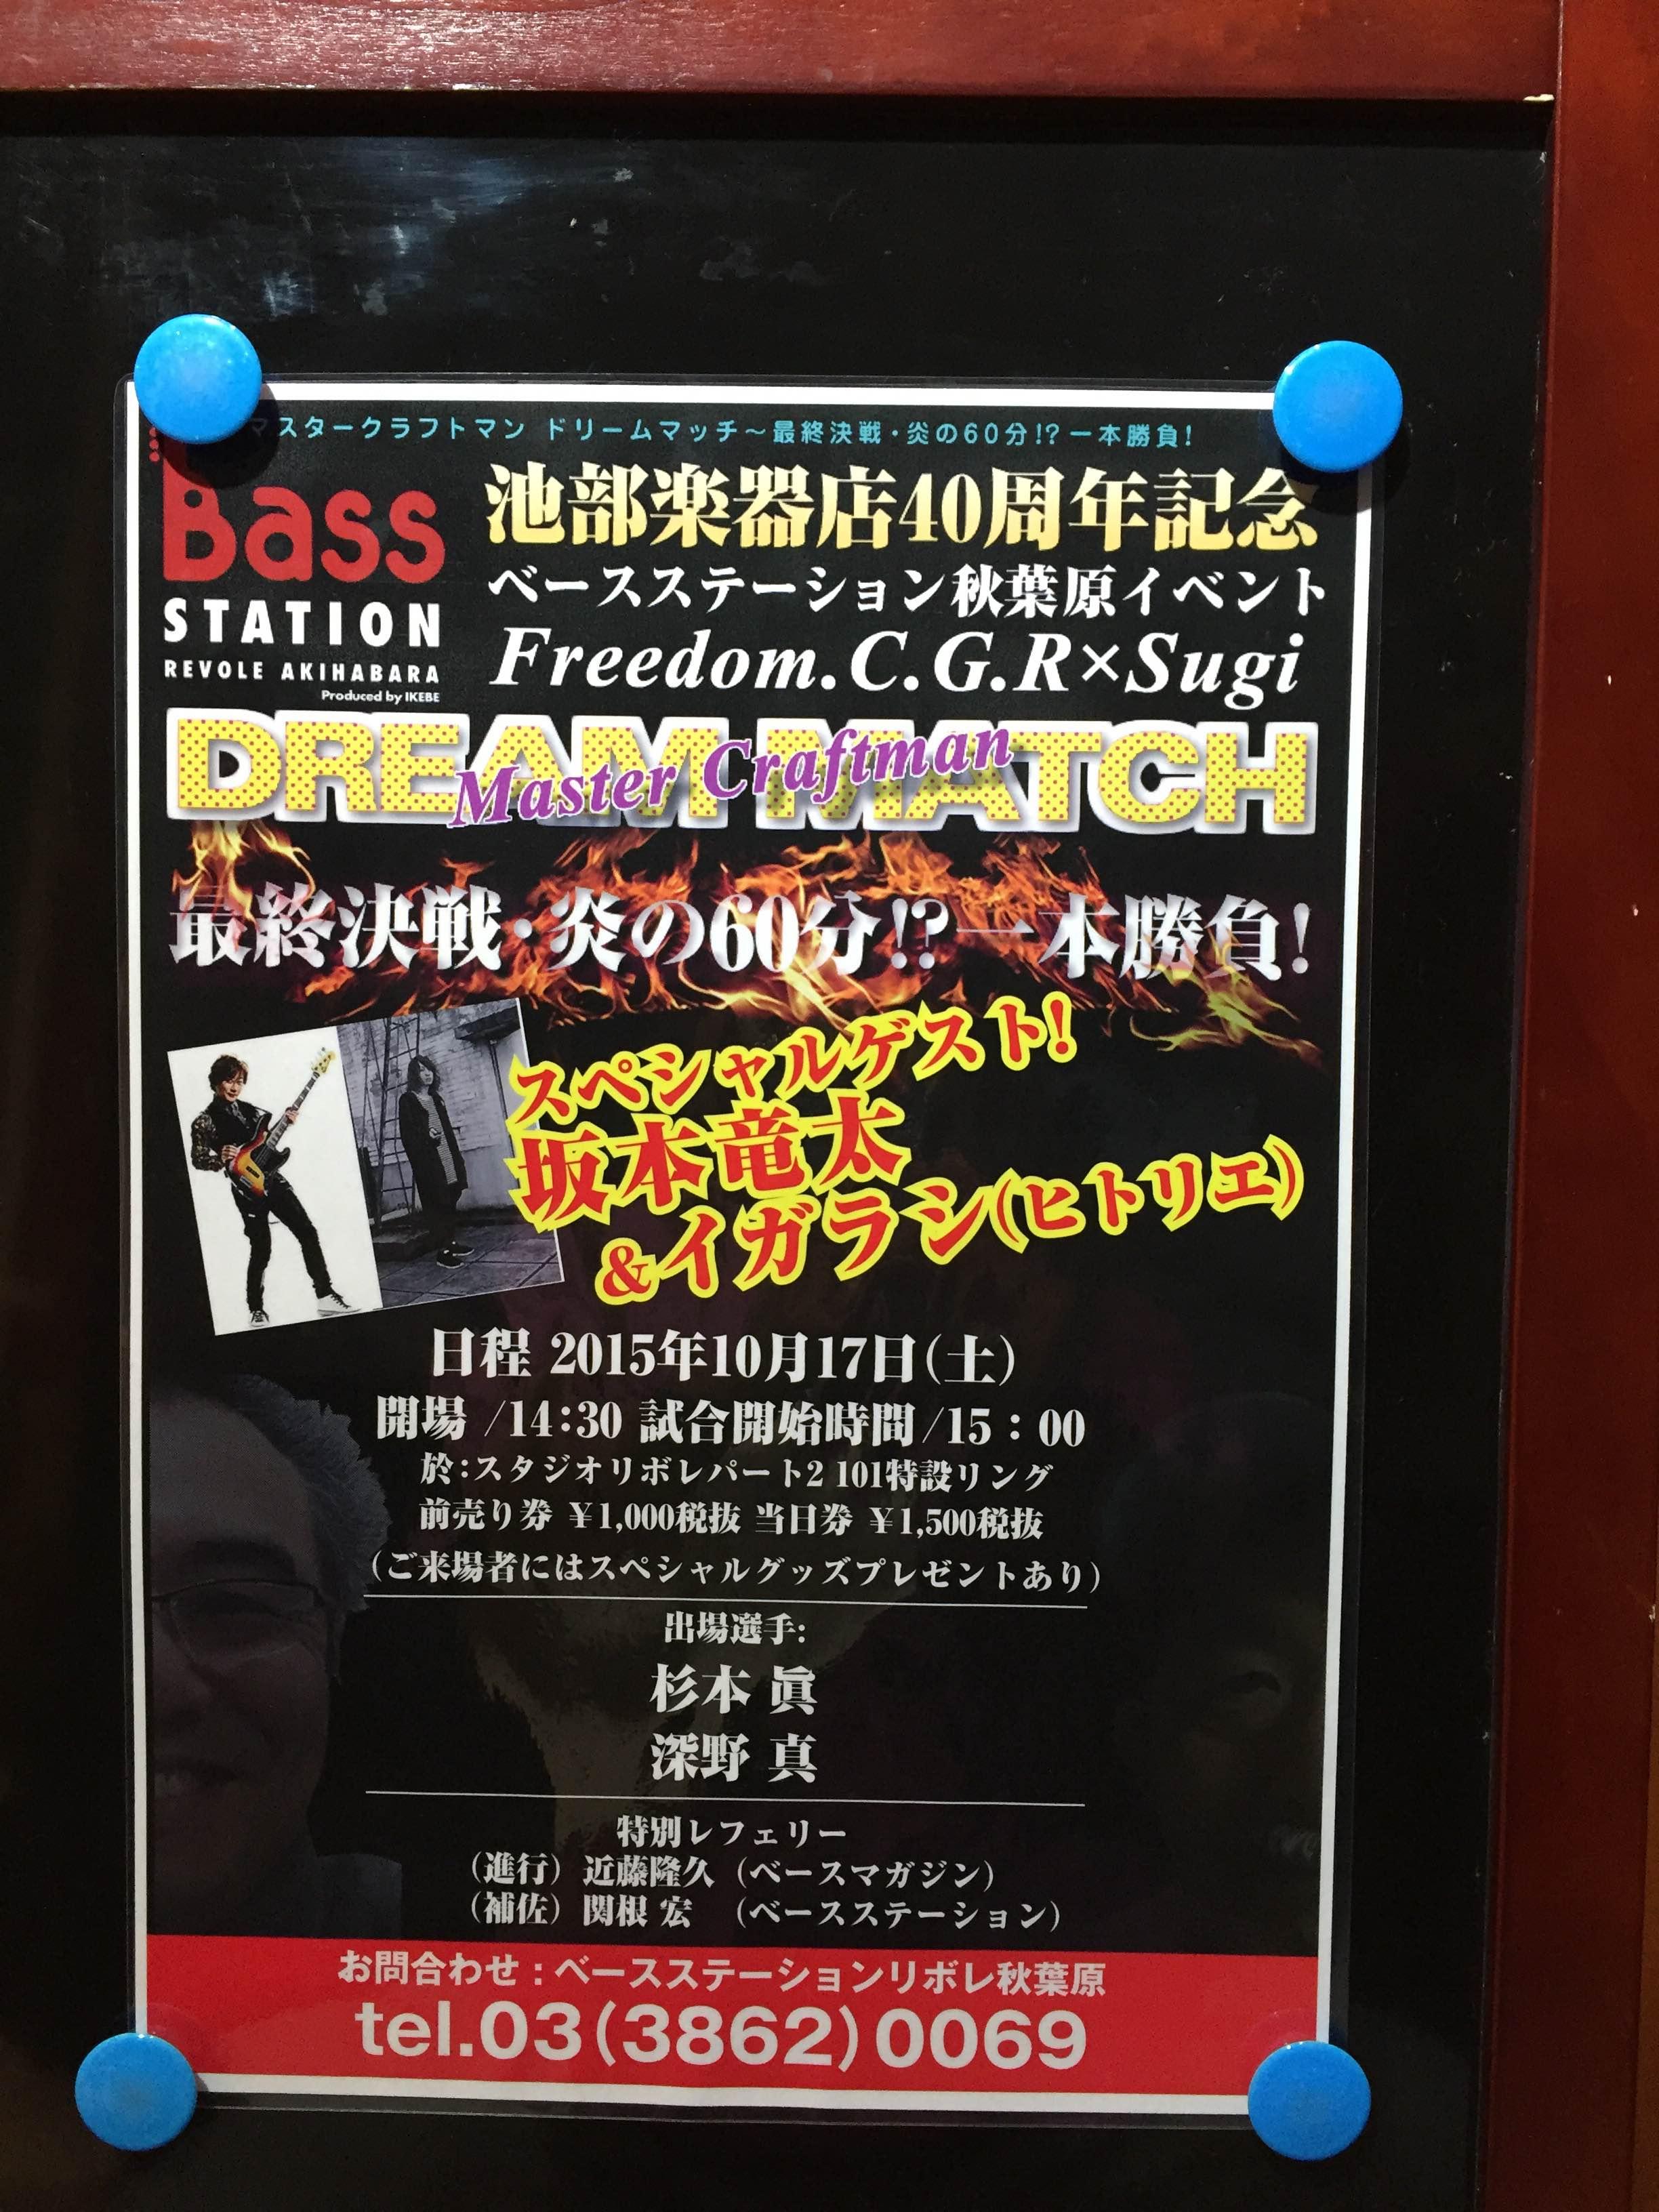 『Freedom C.G.R × Sugi ドリームマッチ』最終決戦